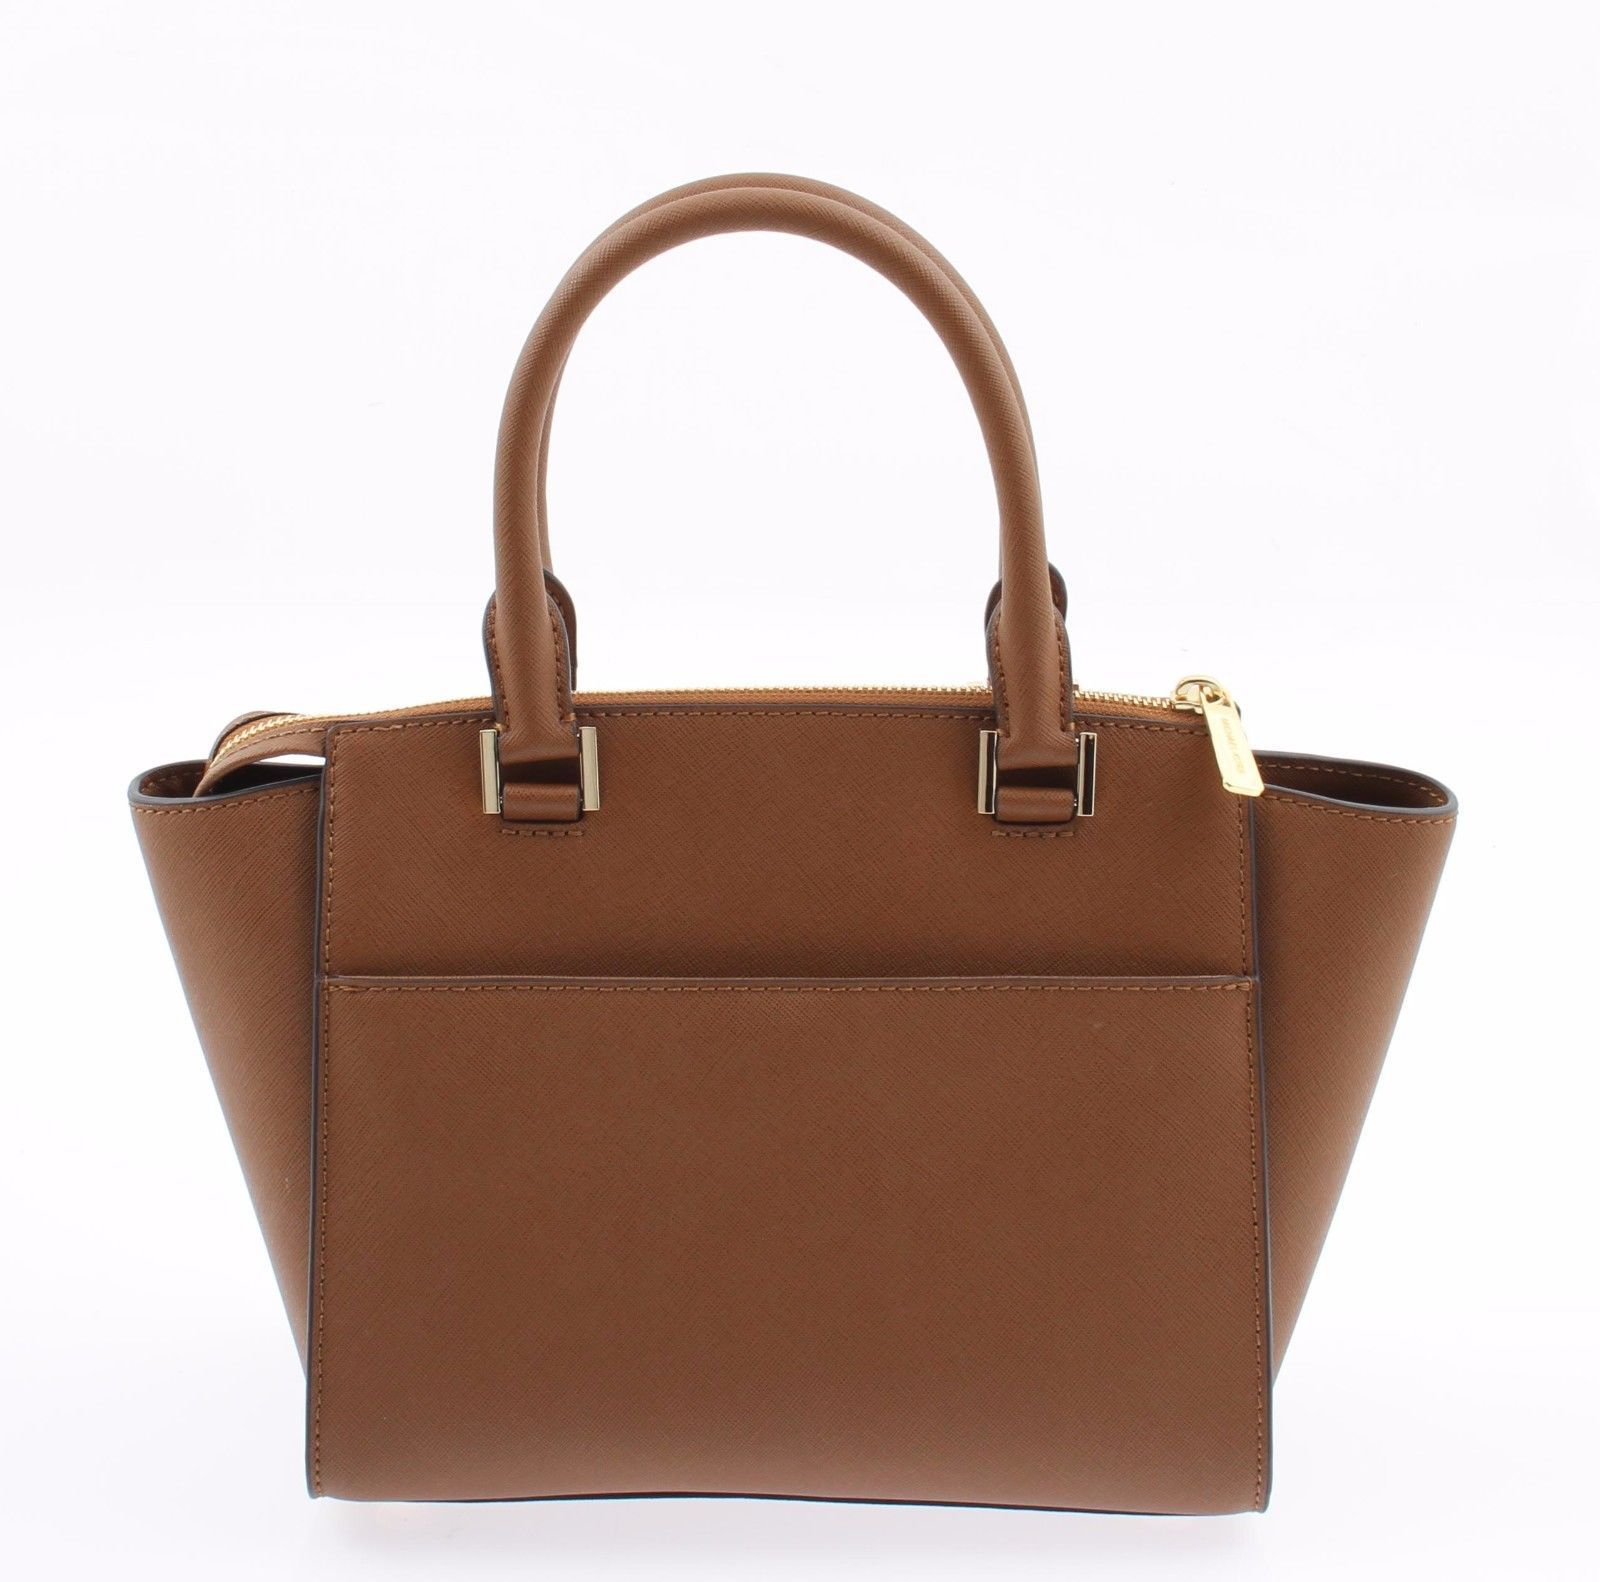 f266f2bb72cc Michael Kors Hudson Medium Satchel Shoulder Crossbody Handbag Saffiano  Leather